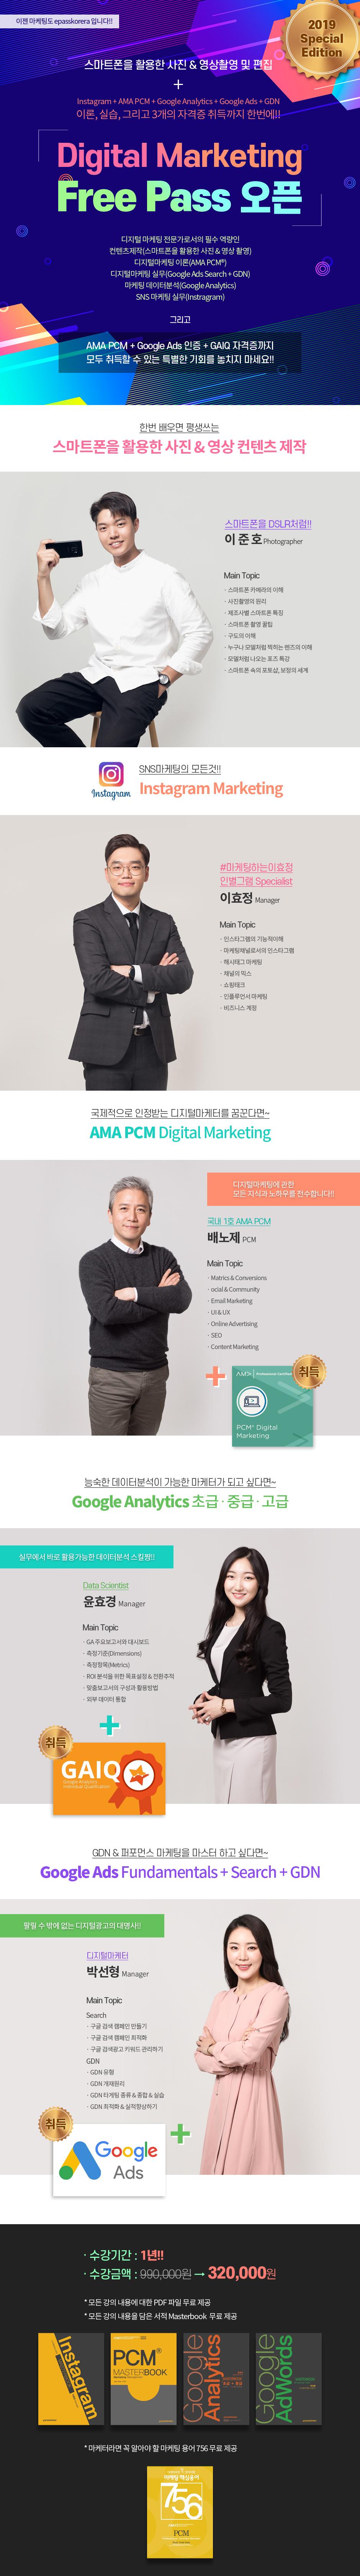 Digital Marketing Free Pass 오픈